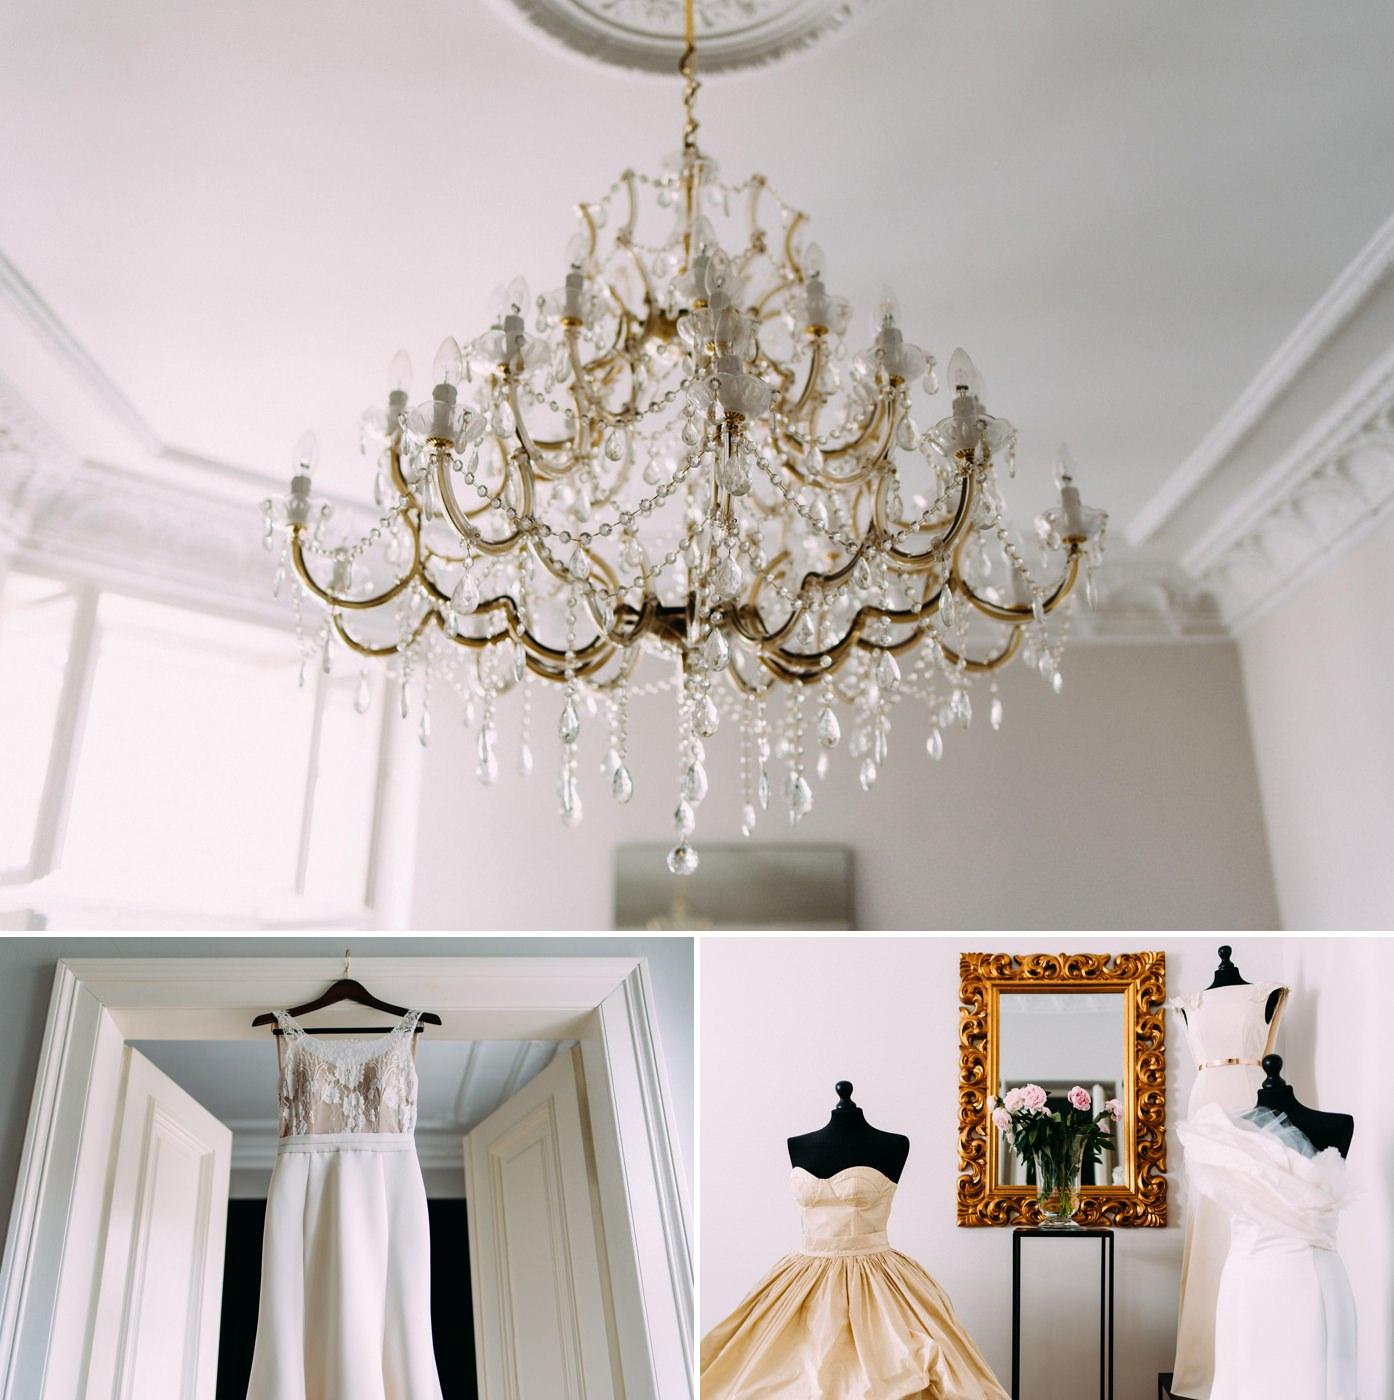 suknia slubna atelier robert czerwik- wesele amber room warszawa- luke sezeck